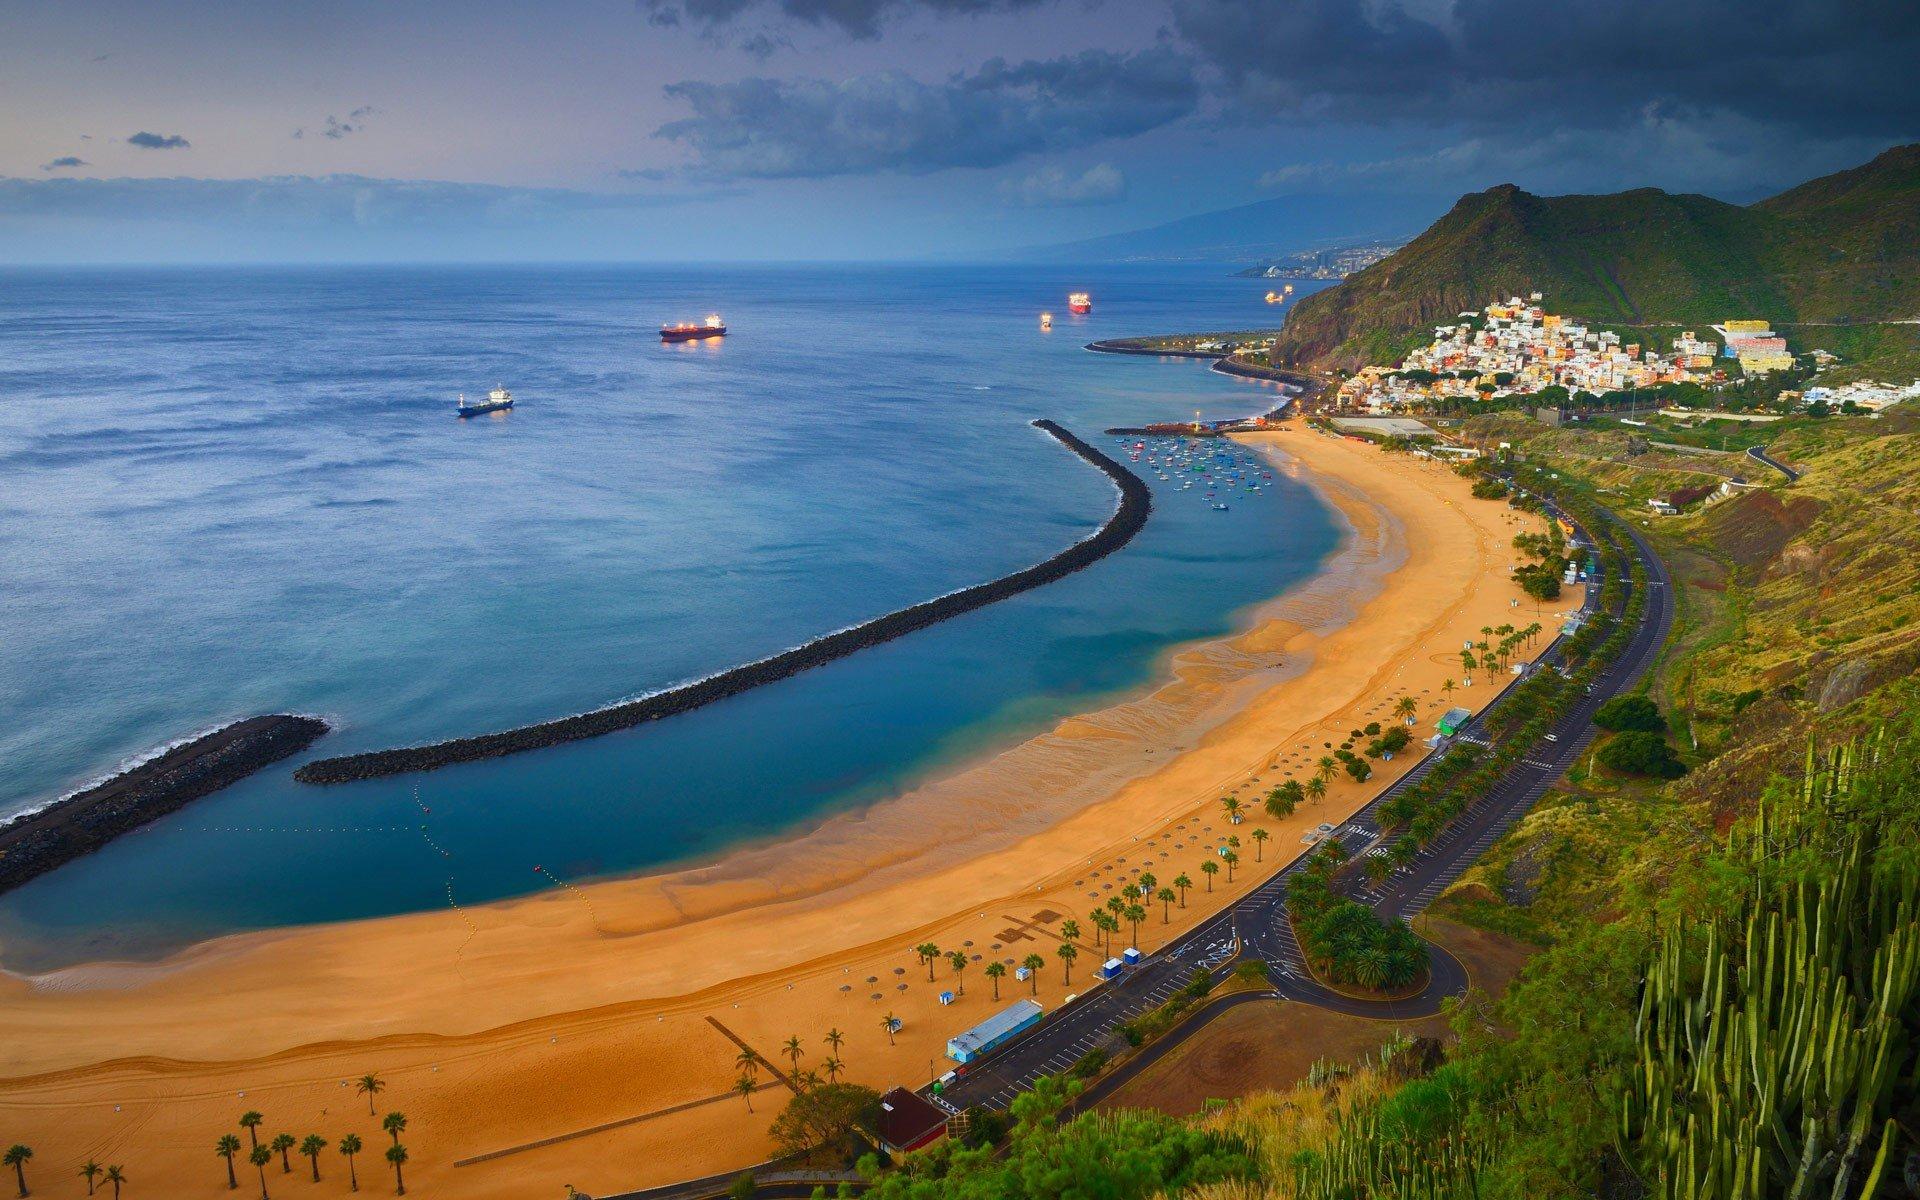 Beach in Canary Islands